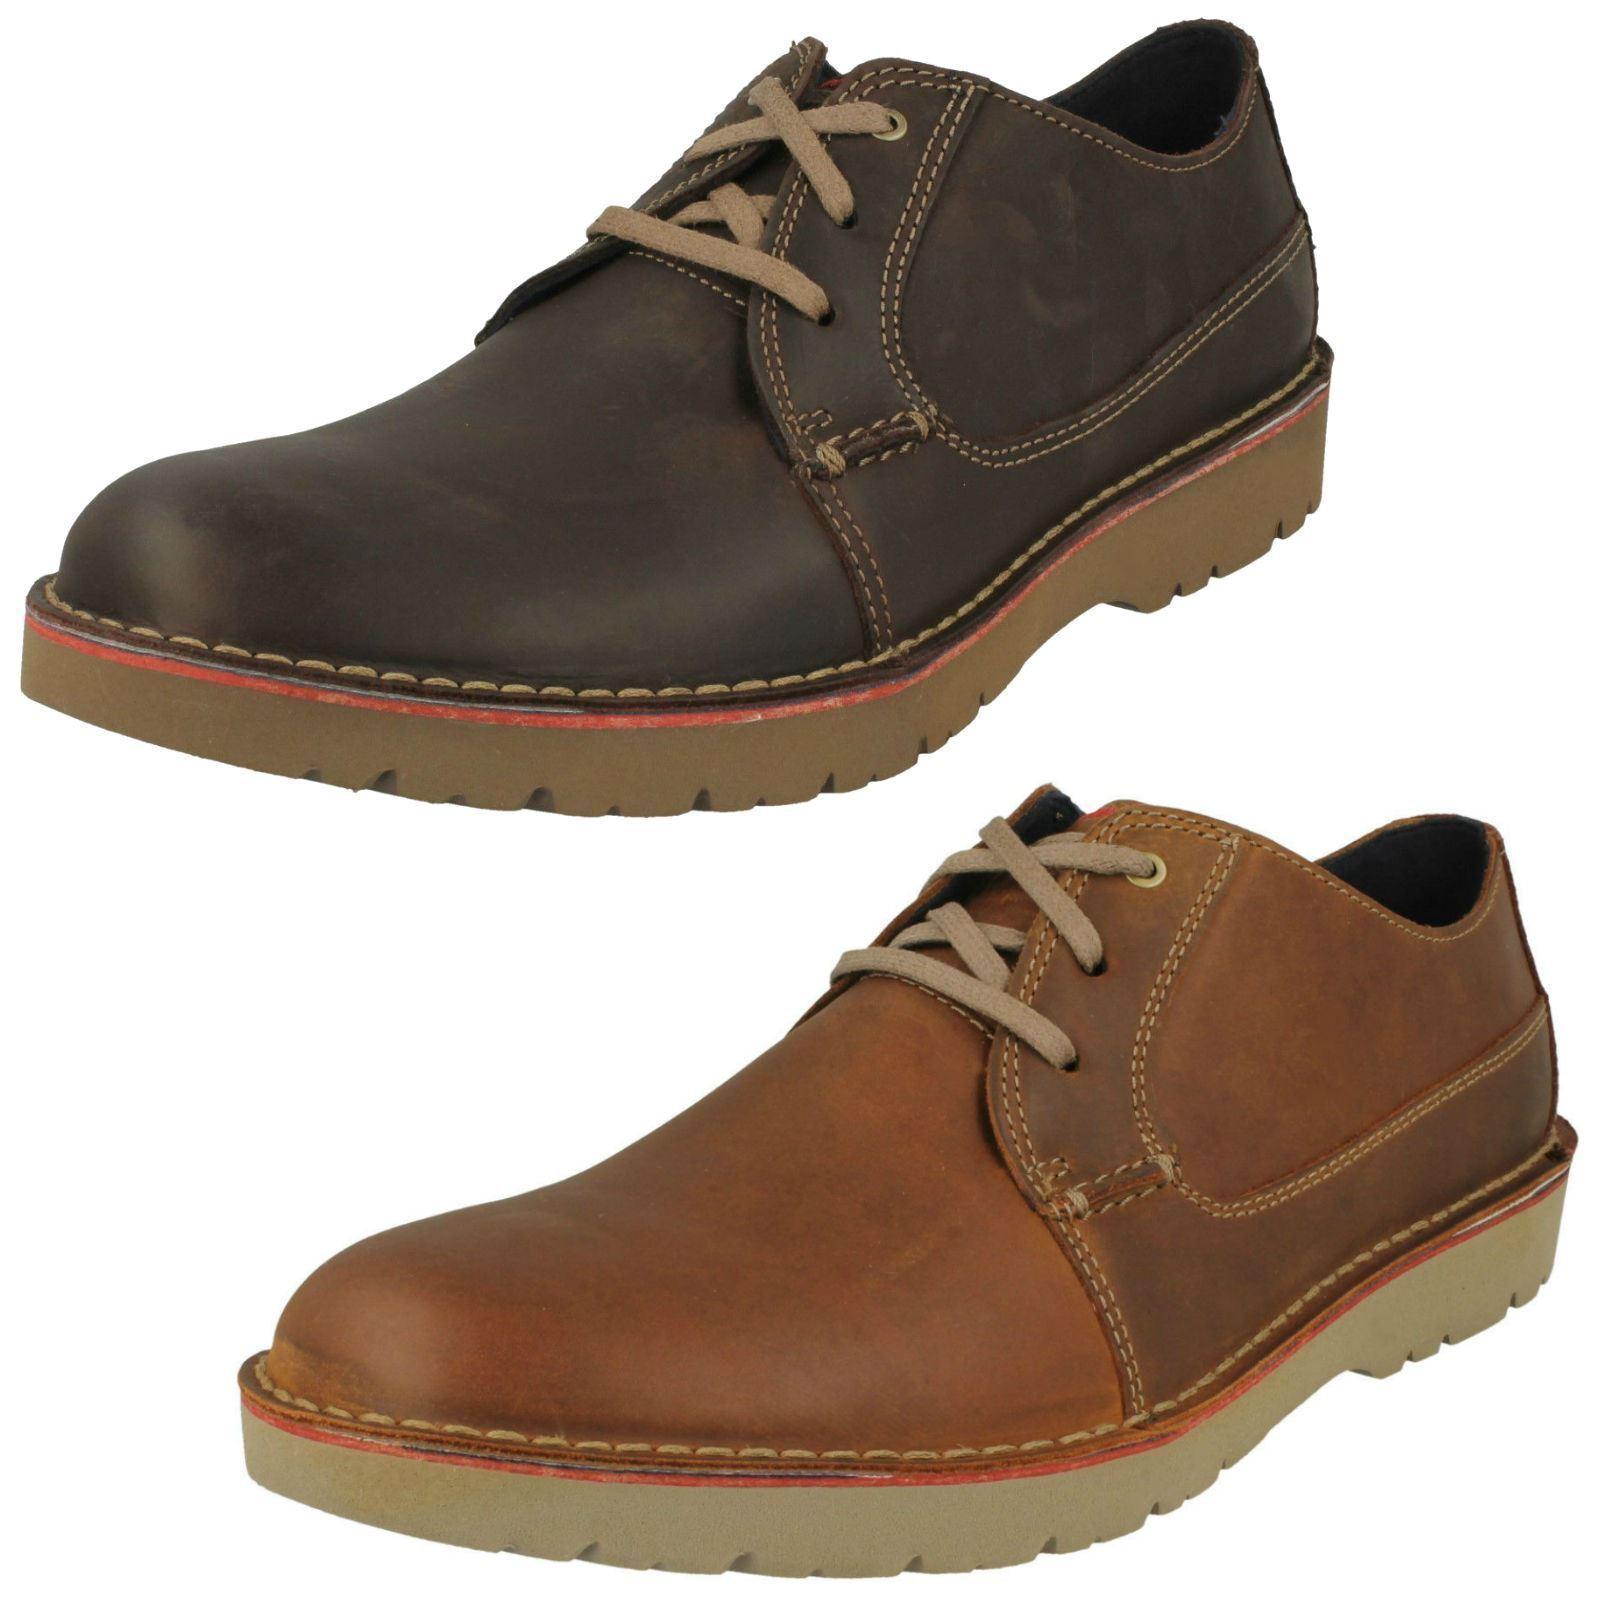 Uomo Clarks Vargo Plain Dark Braun Or Dark Tan Casual Leder Schuhes G fitting